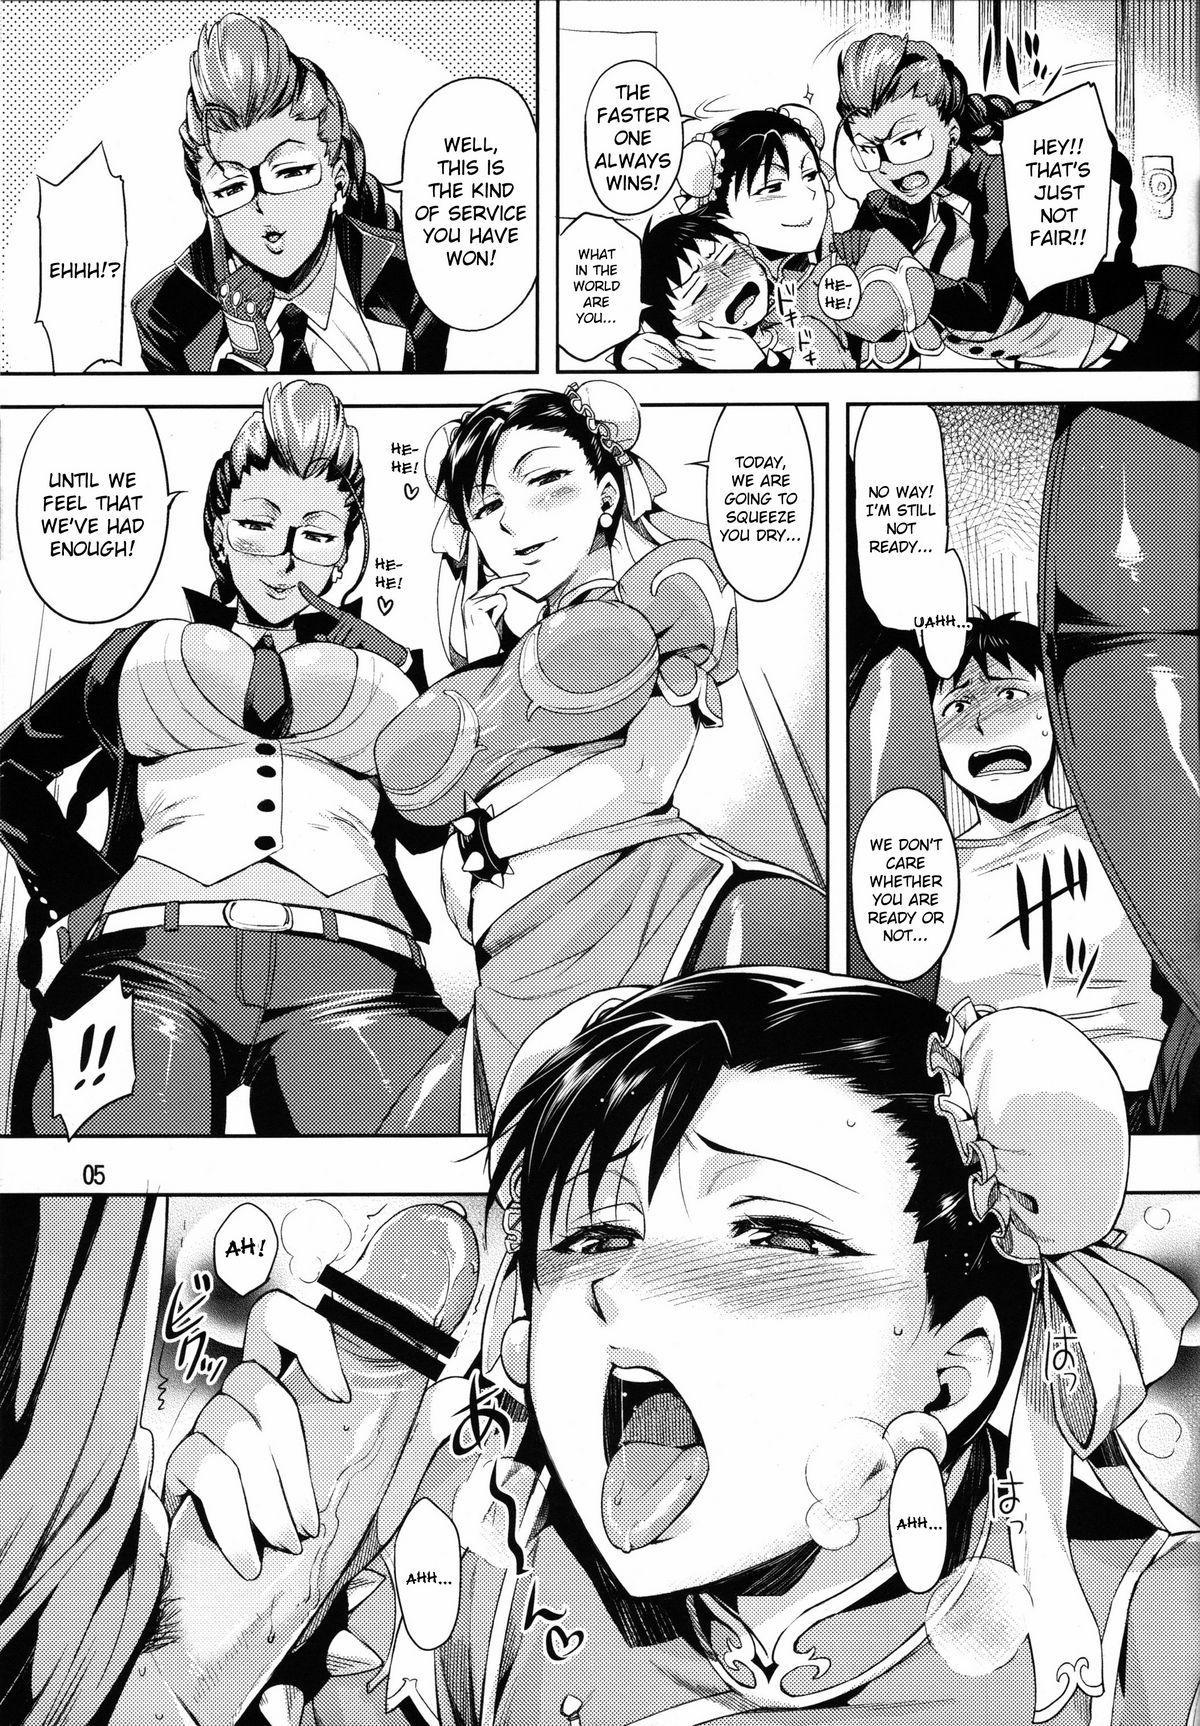 (COMIC1☆5) [ReDrop (Miyamoto Smoke, Otsumami)] Haru no Chun-Li Bon   The Chun-Li Spring Book (Street Fighter) [English] {doujin-moe.us} 4